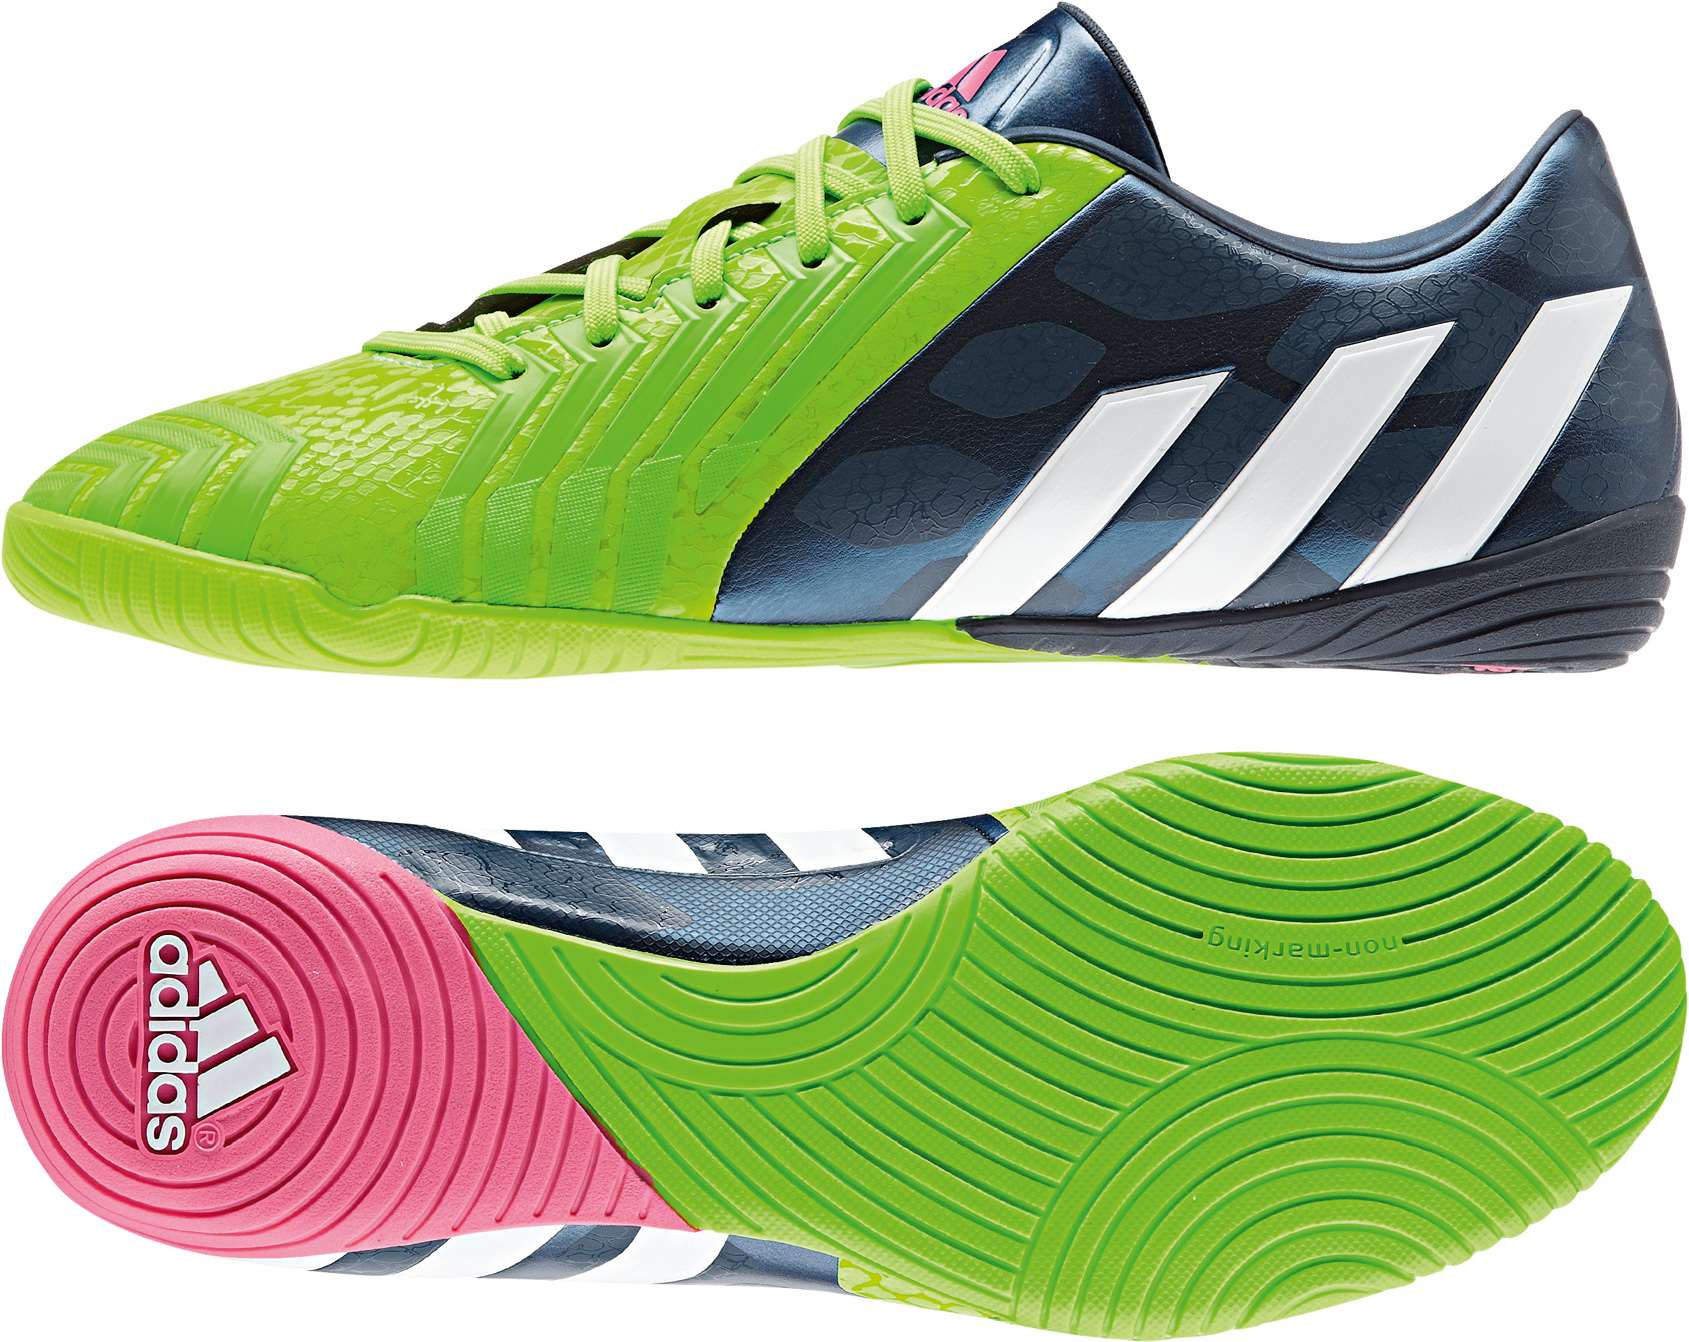 Fußball Schuhe P Absolado Instinct IN, RICBLU/FTWWHT/SGREEN, 6